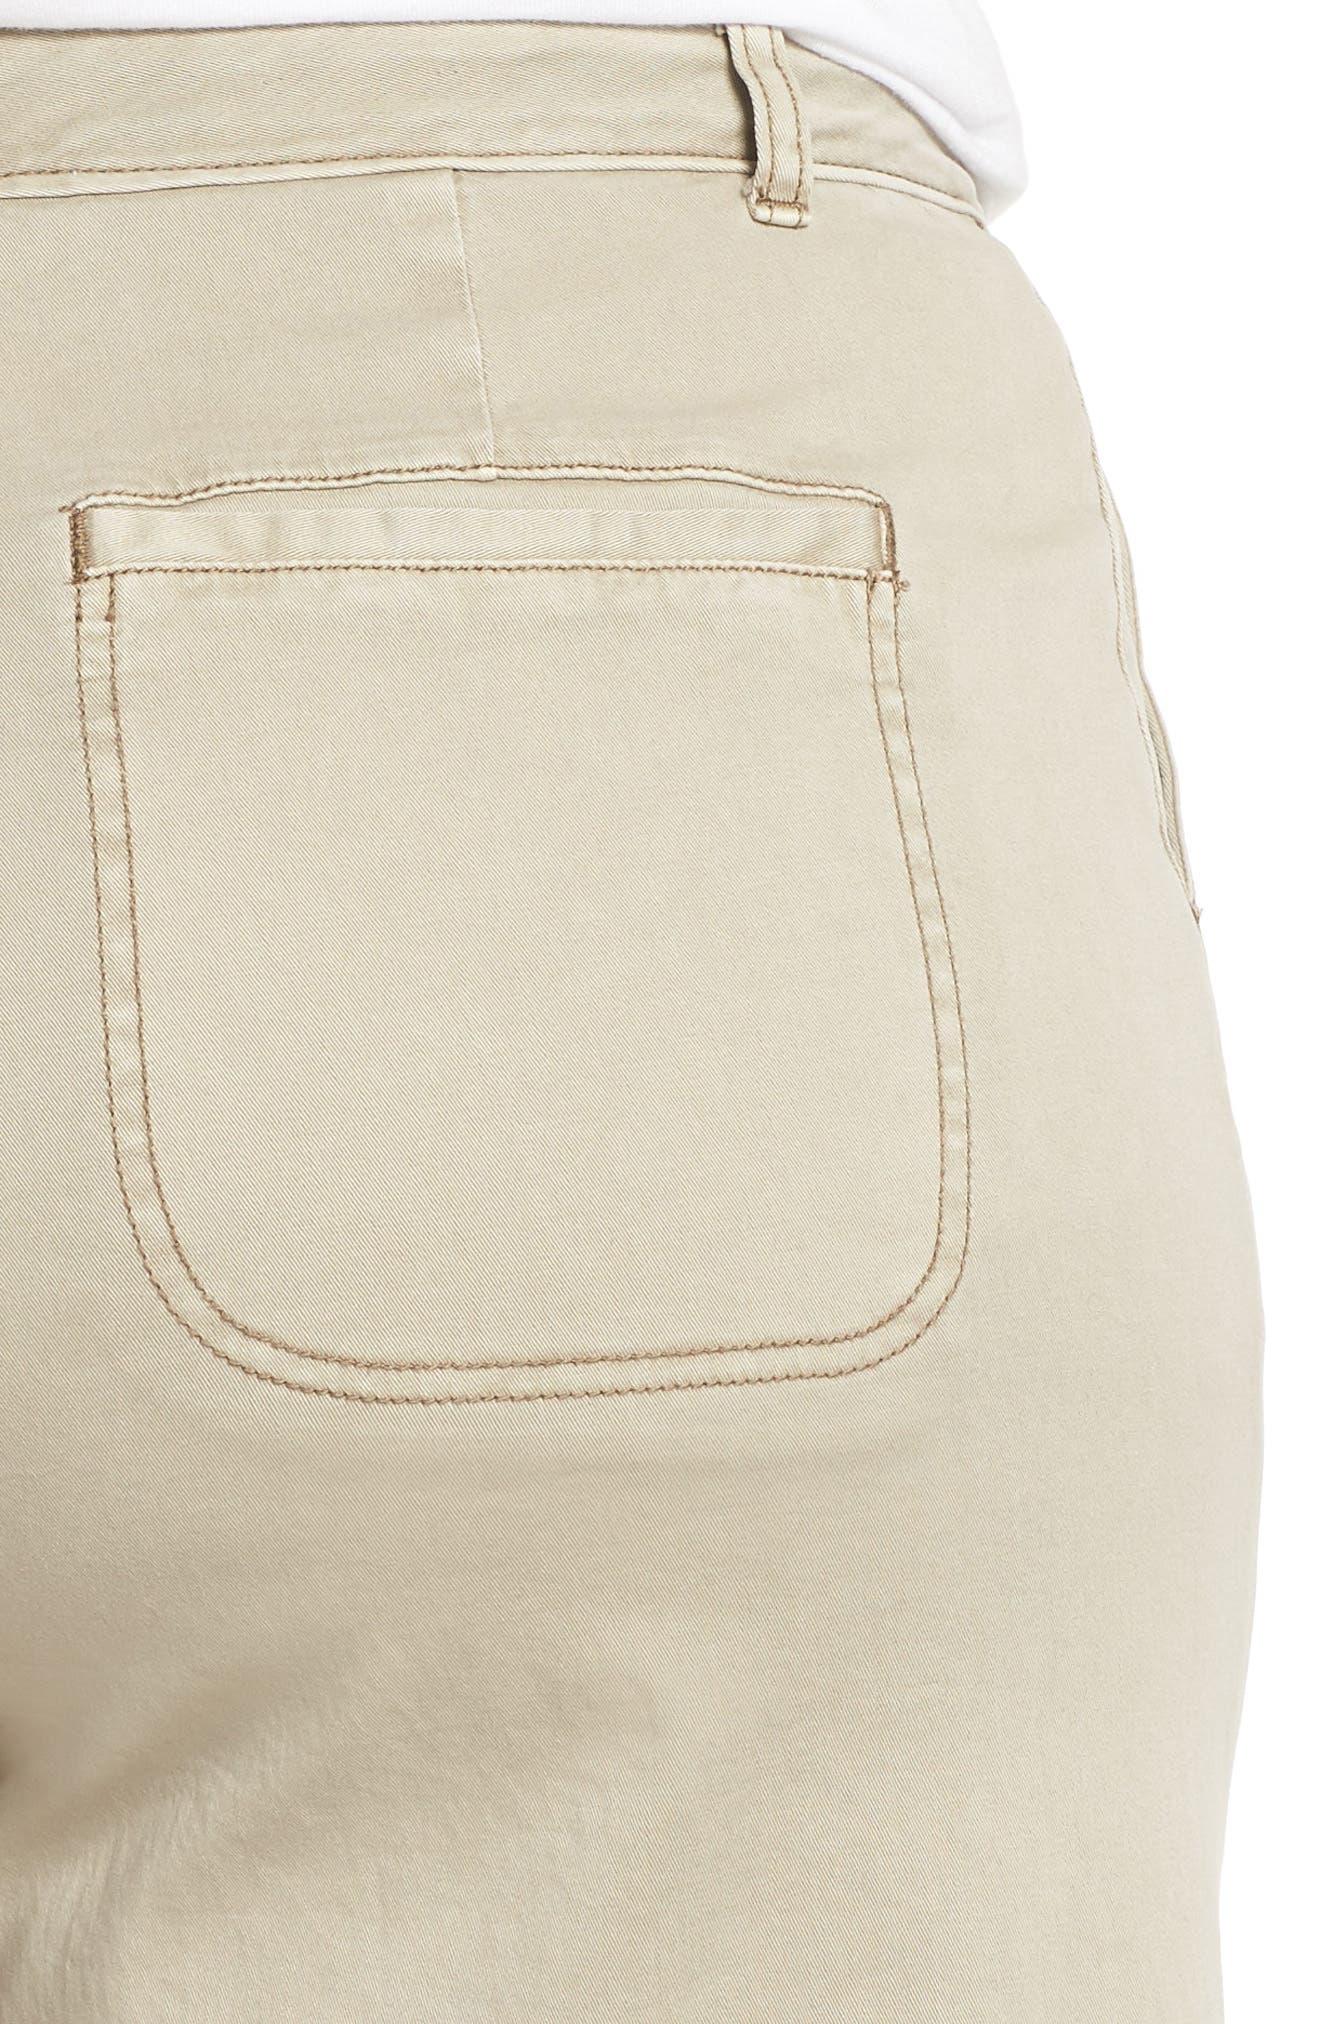 Wide Leg Stretch Cotton Twill Crop Pants,                             Alternate thumbnail 4, color,                             Tan Cobblestone